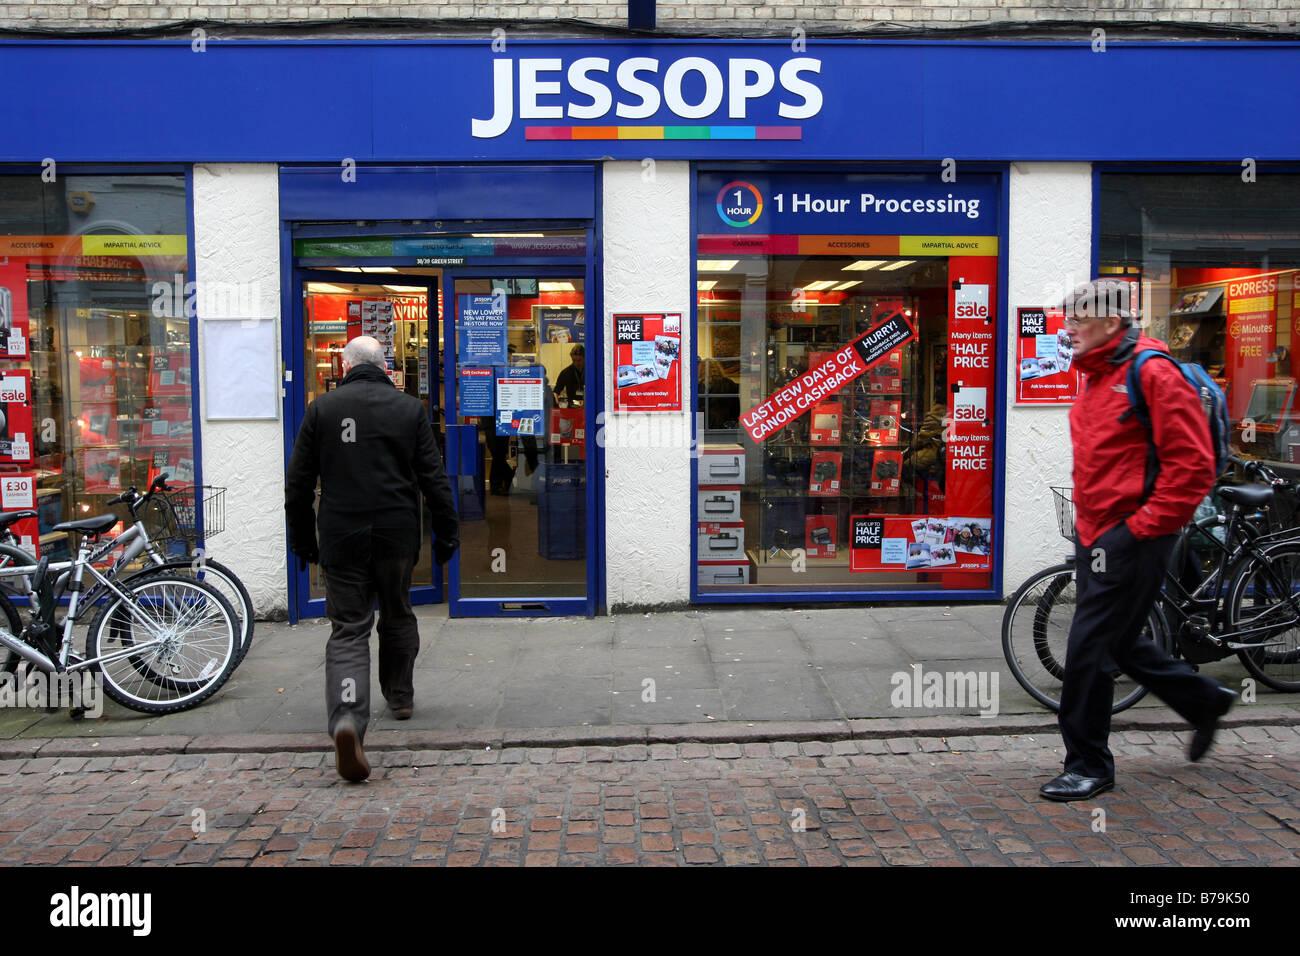 JESSOPS CAMERA SHOP  IN CAMBRIDGE - Stock Image